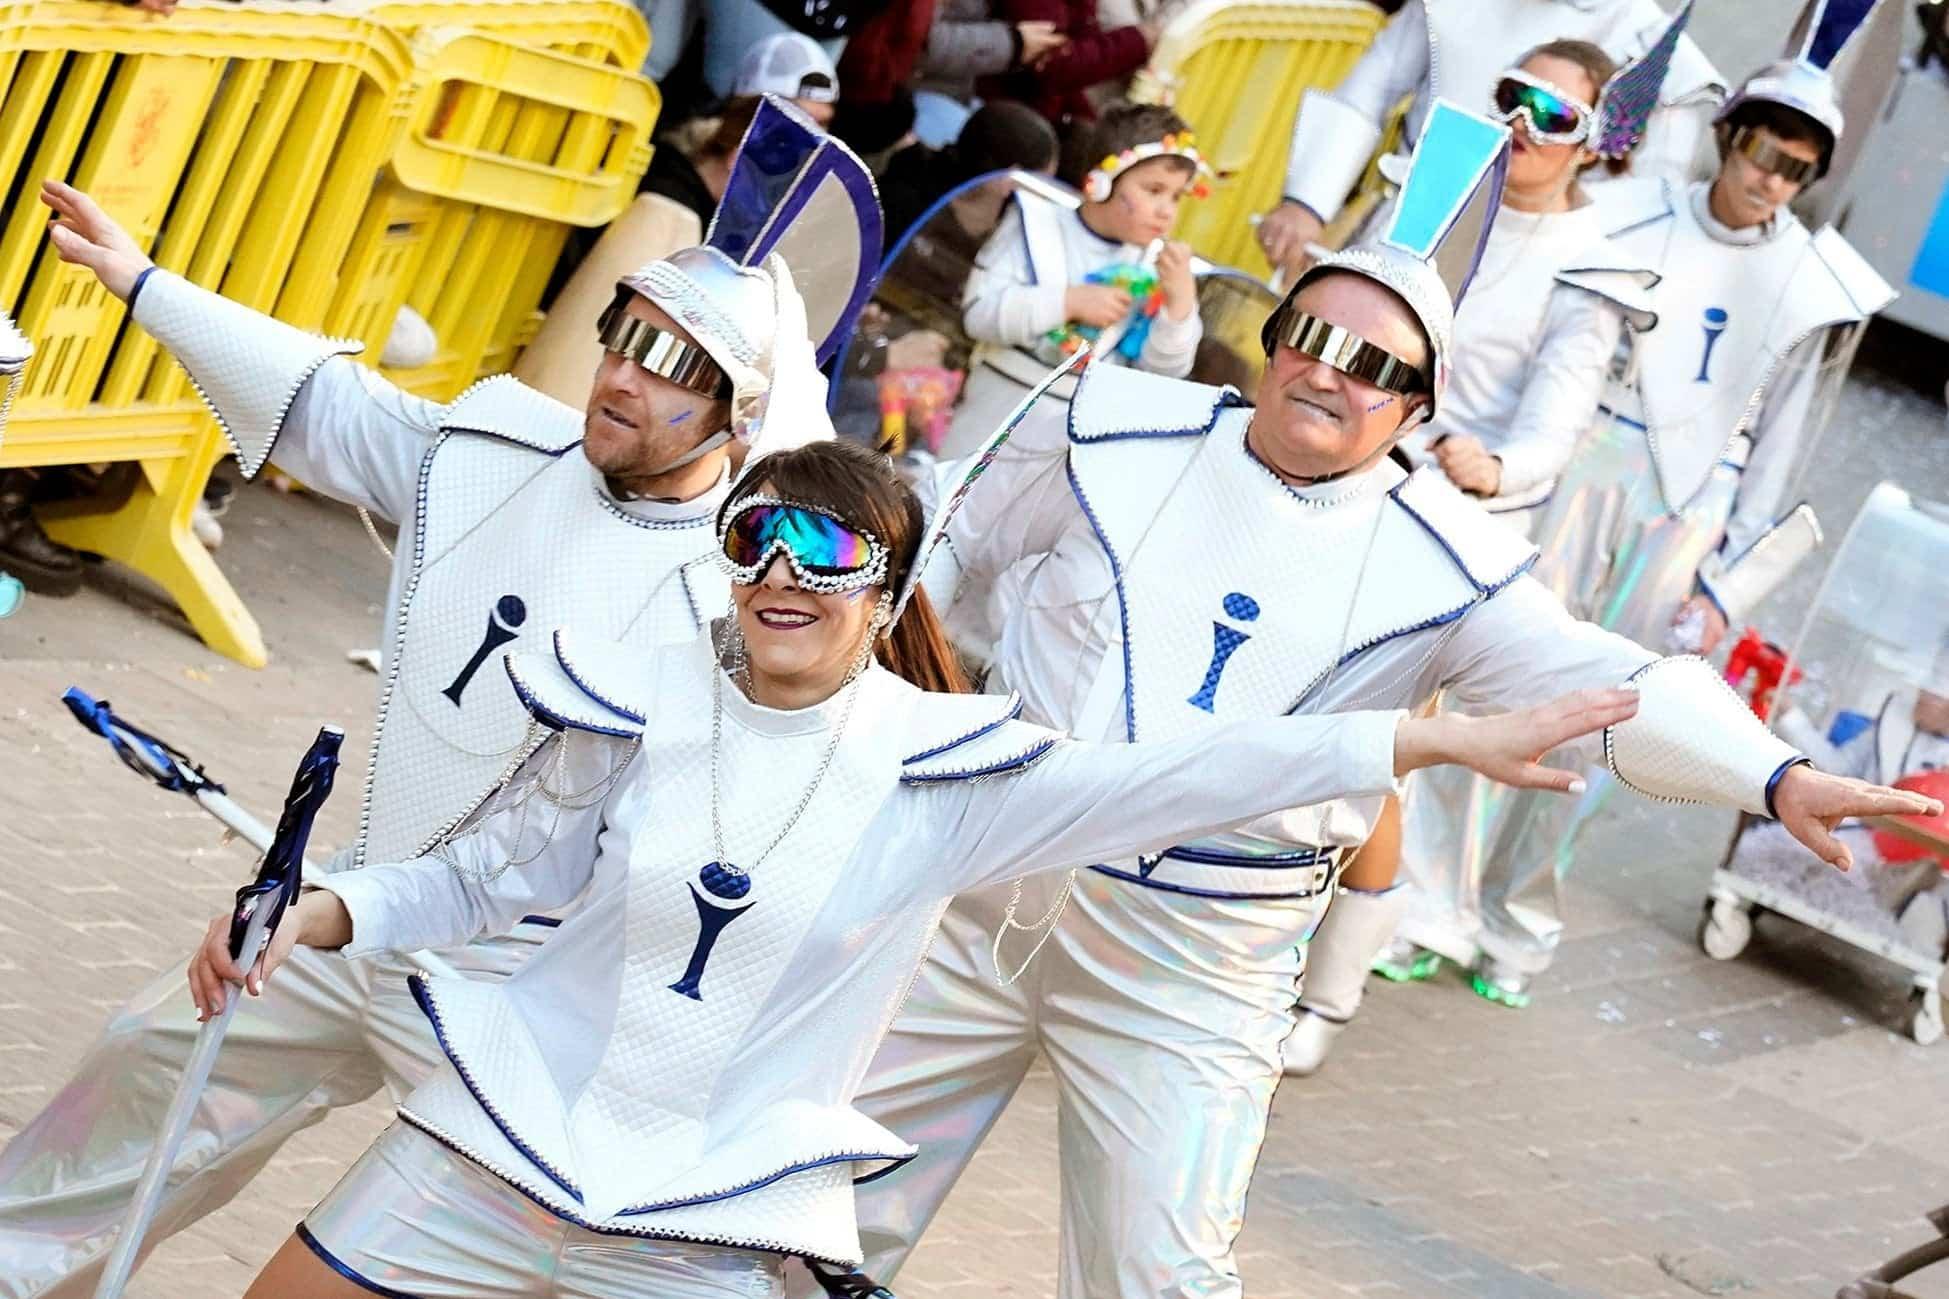 Carnaval de herencia 2020 ofertorio 46 - Selección de fotografías del Ofertorio del Carnaval de Herencia